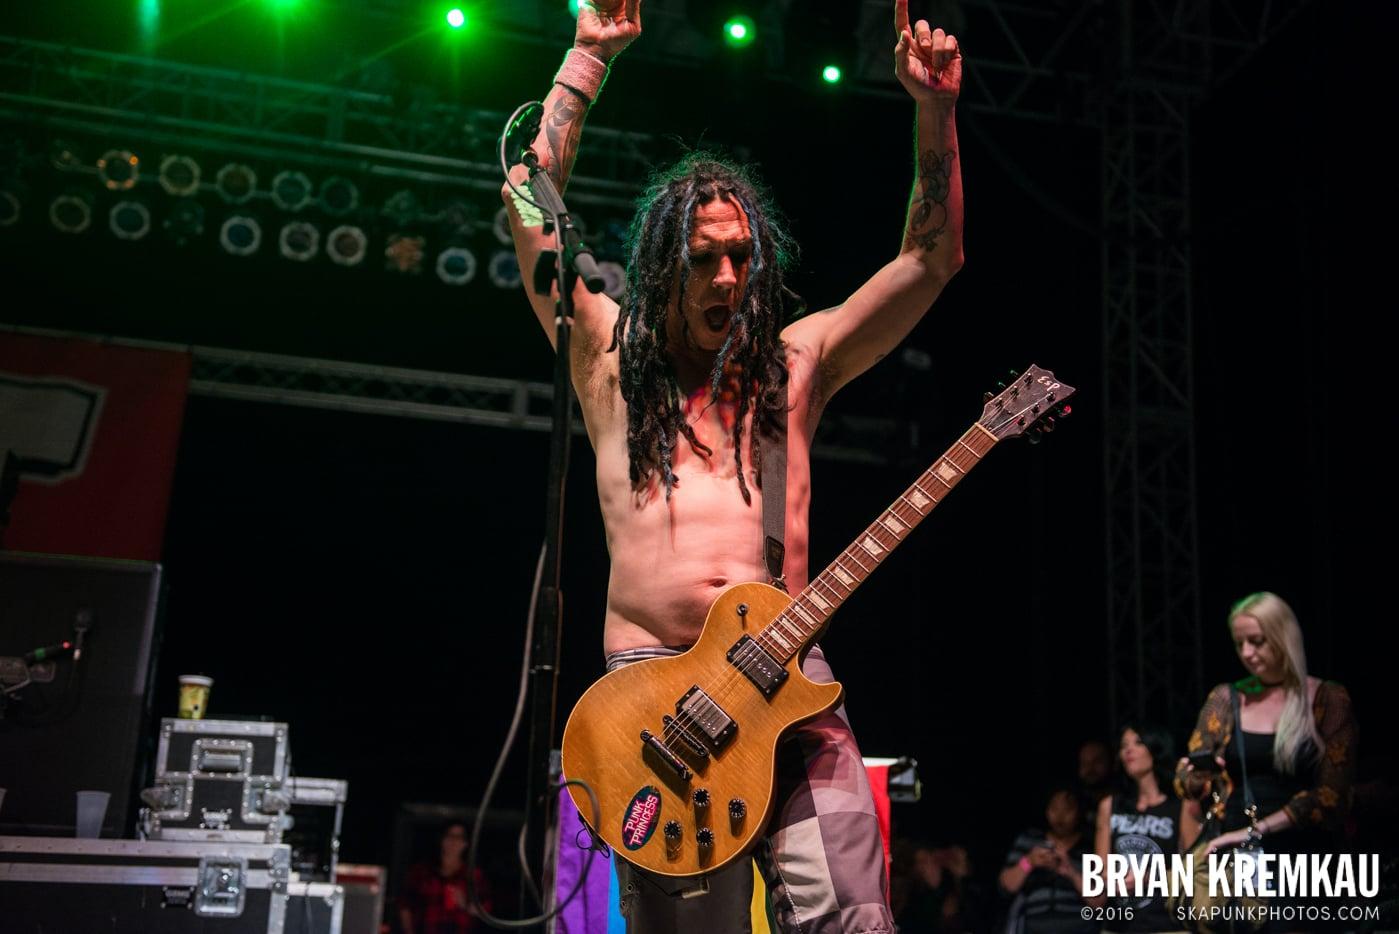 NOFX @ Stone Pony Summer Stage, Asbury Park, NJ - 8.15.15 (17)